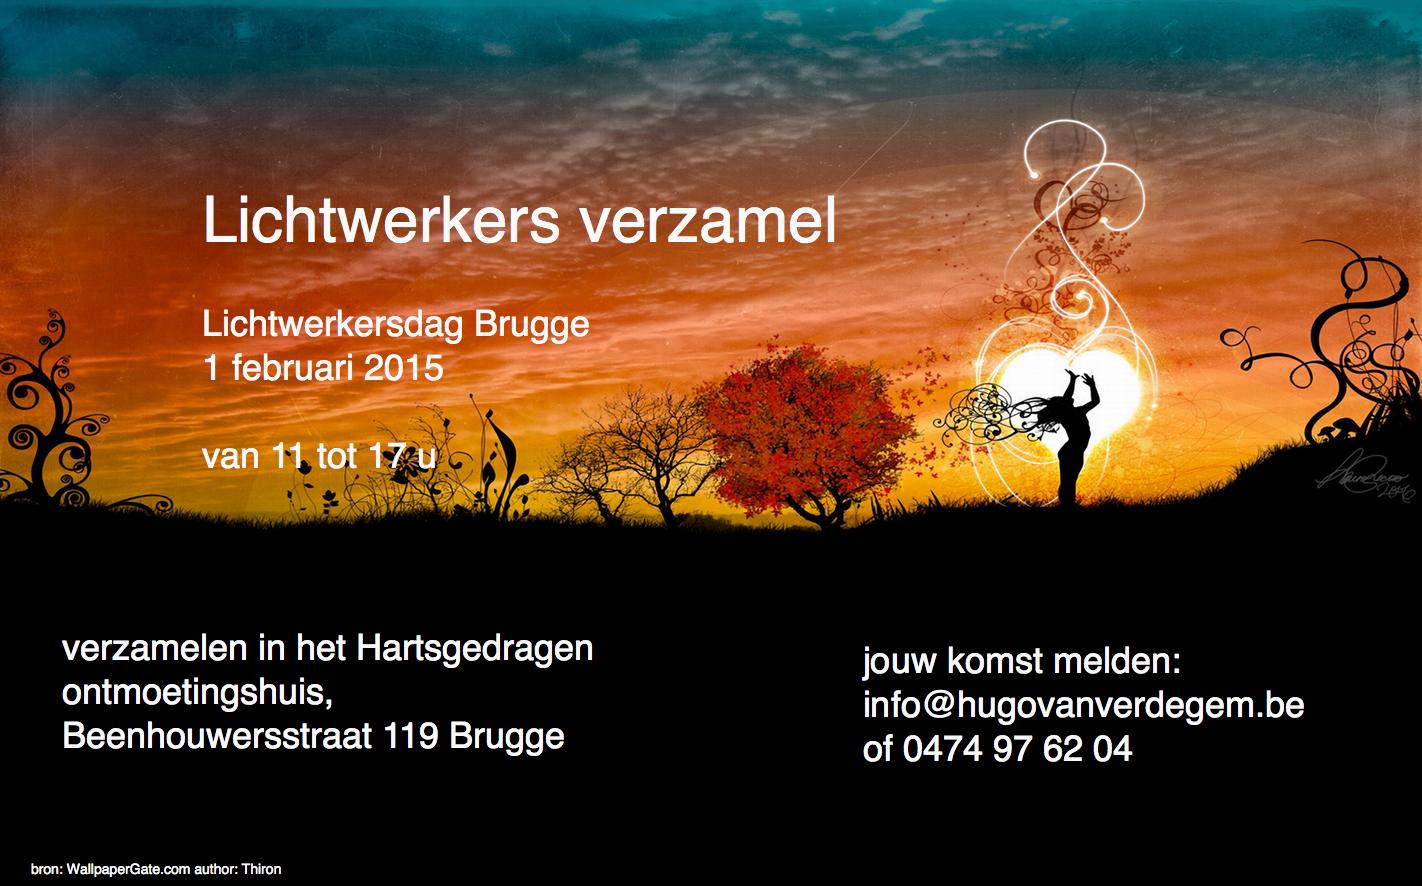 Lichtwerkersdag 1 feb te Brugge. Lichtwerkers verzamel!